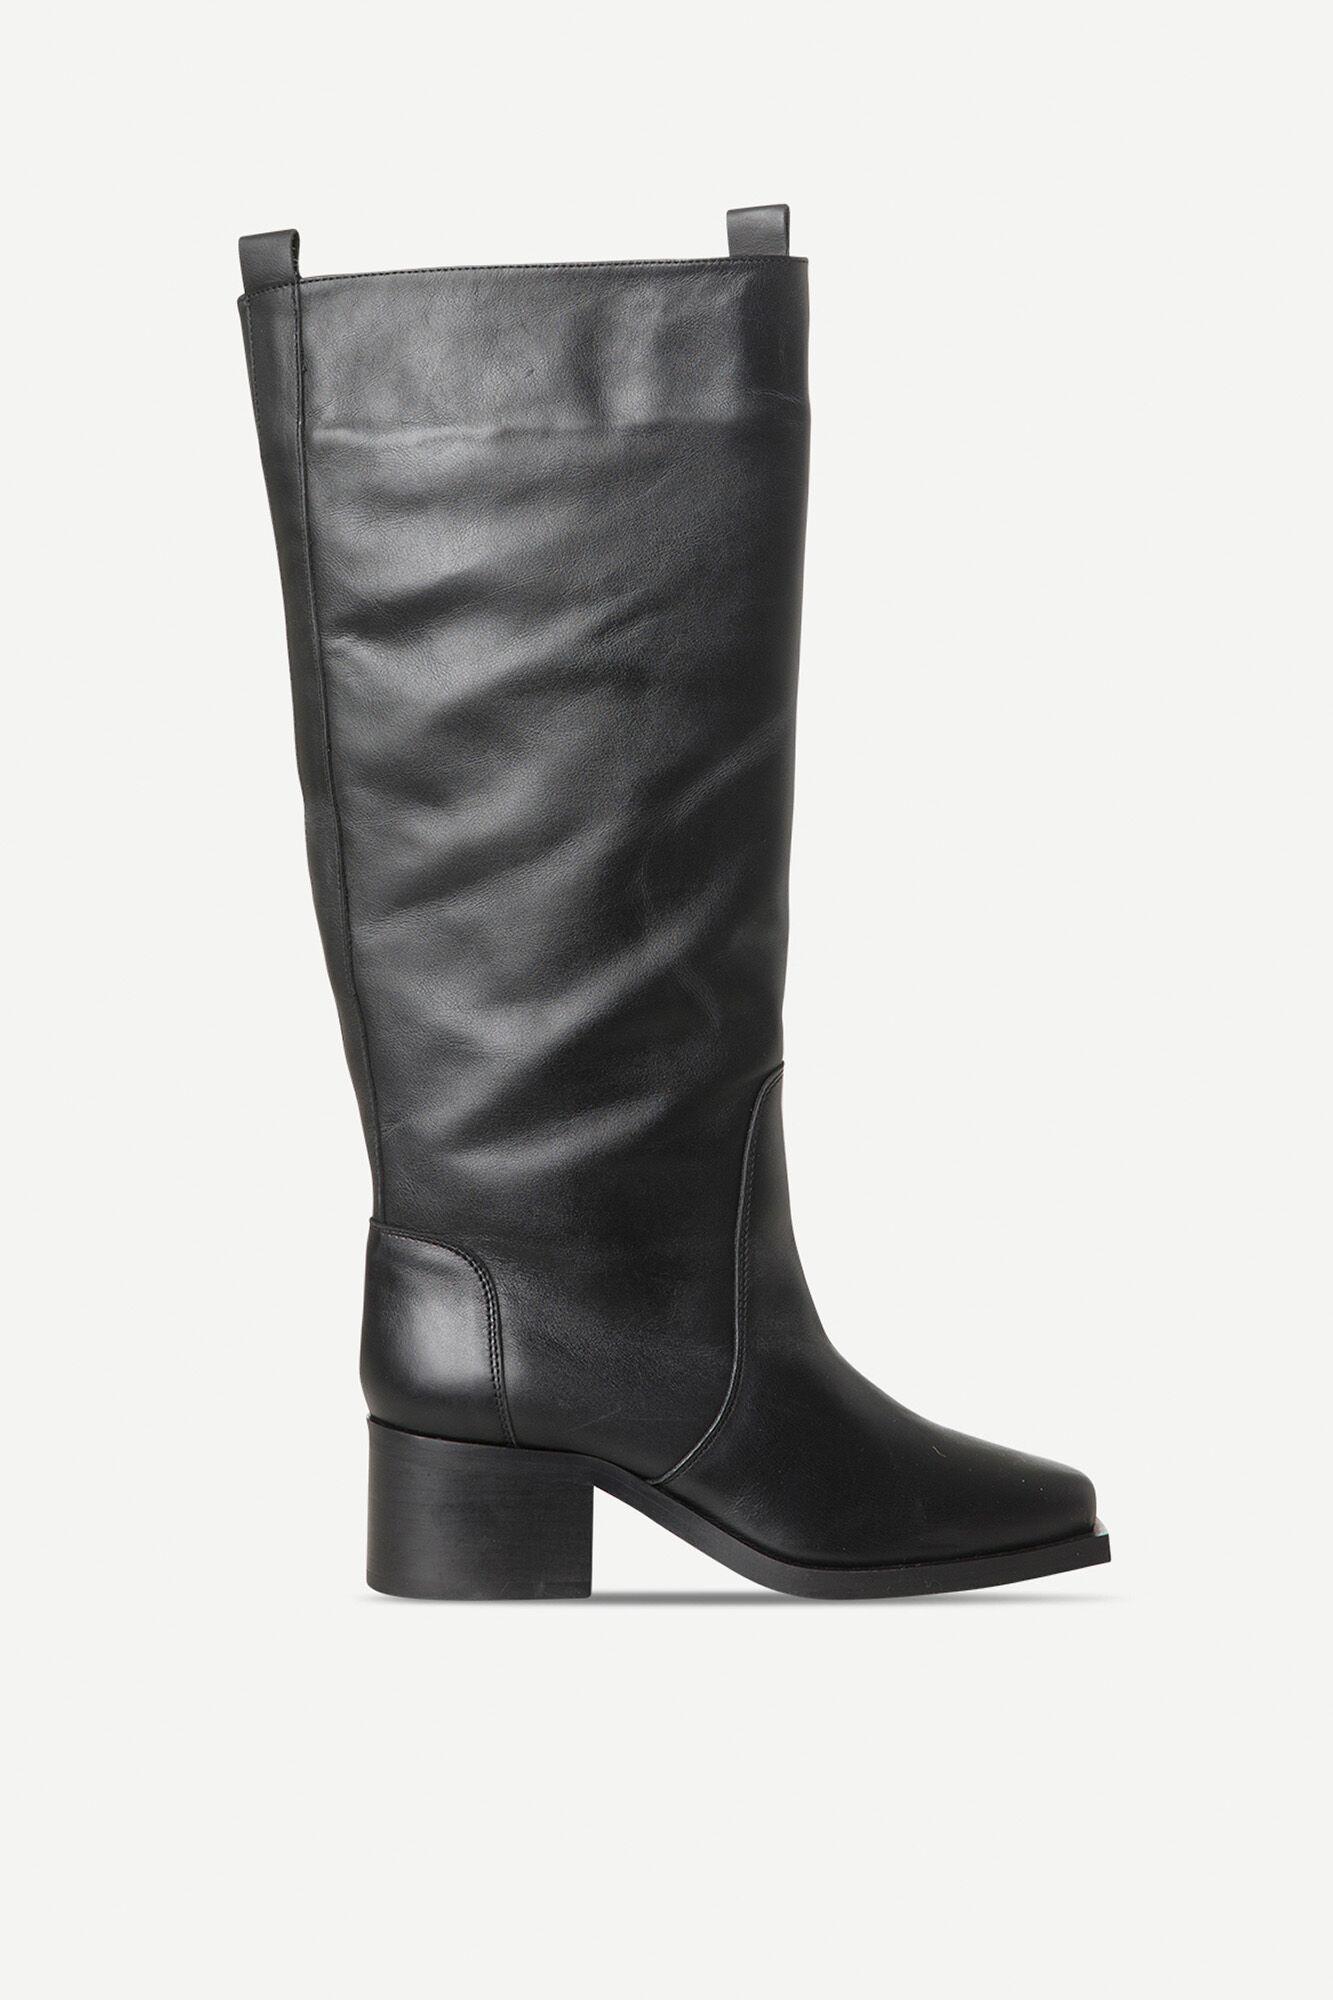 Sofie boot high 14097